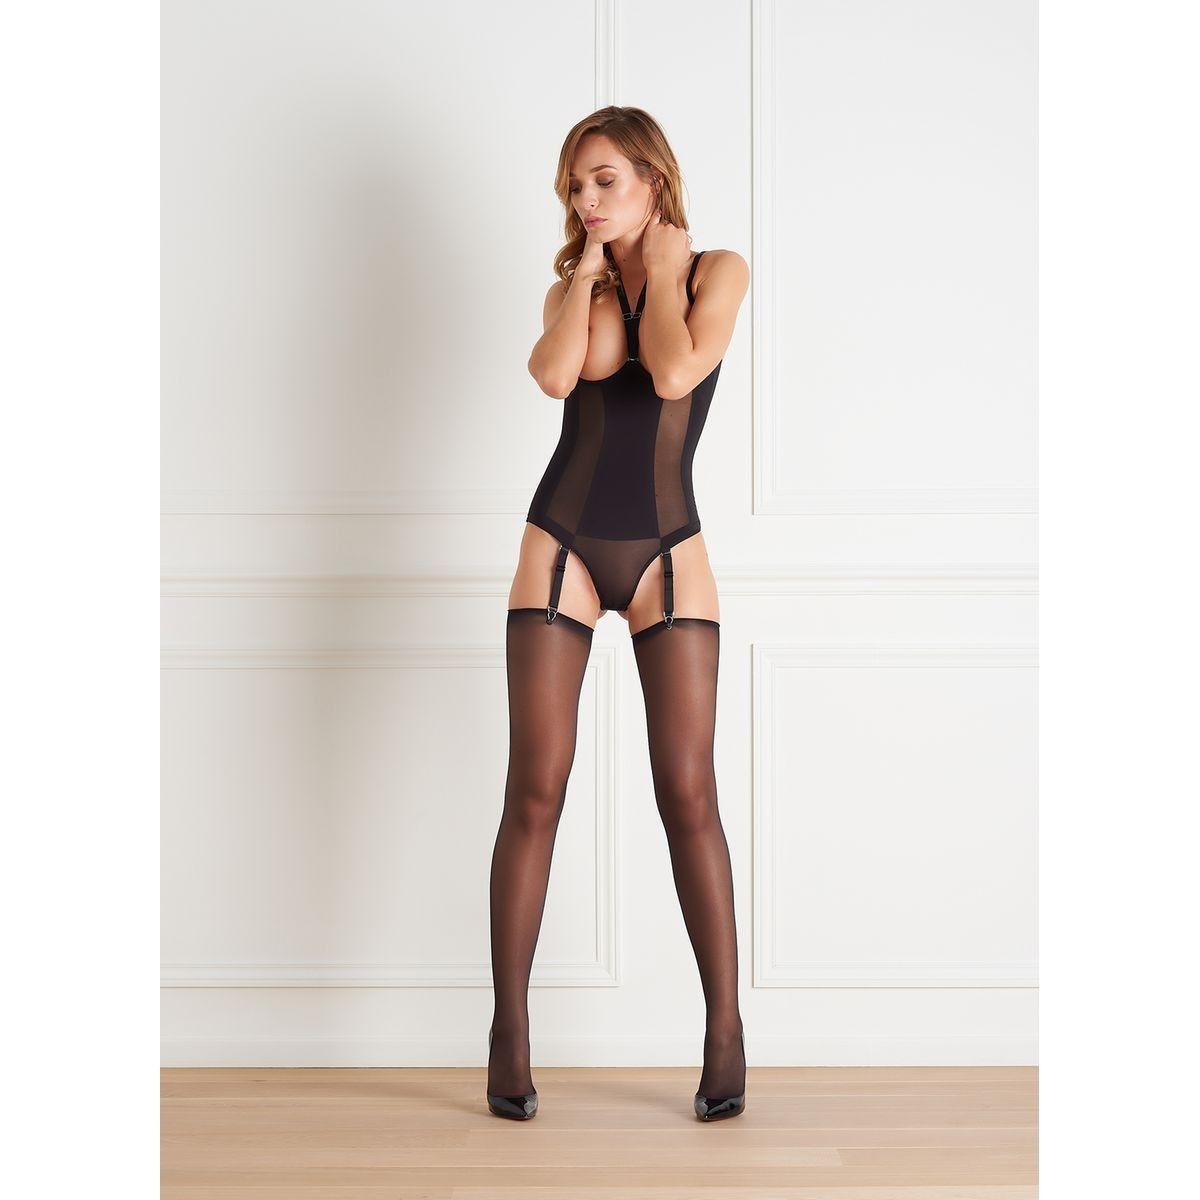 54a538b41ae19 Body String Gainant Seins Nus Belle De Jour - Taille : 44;42;36;38 ...